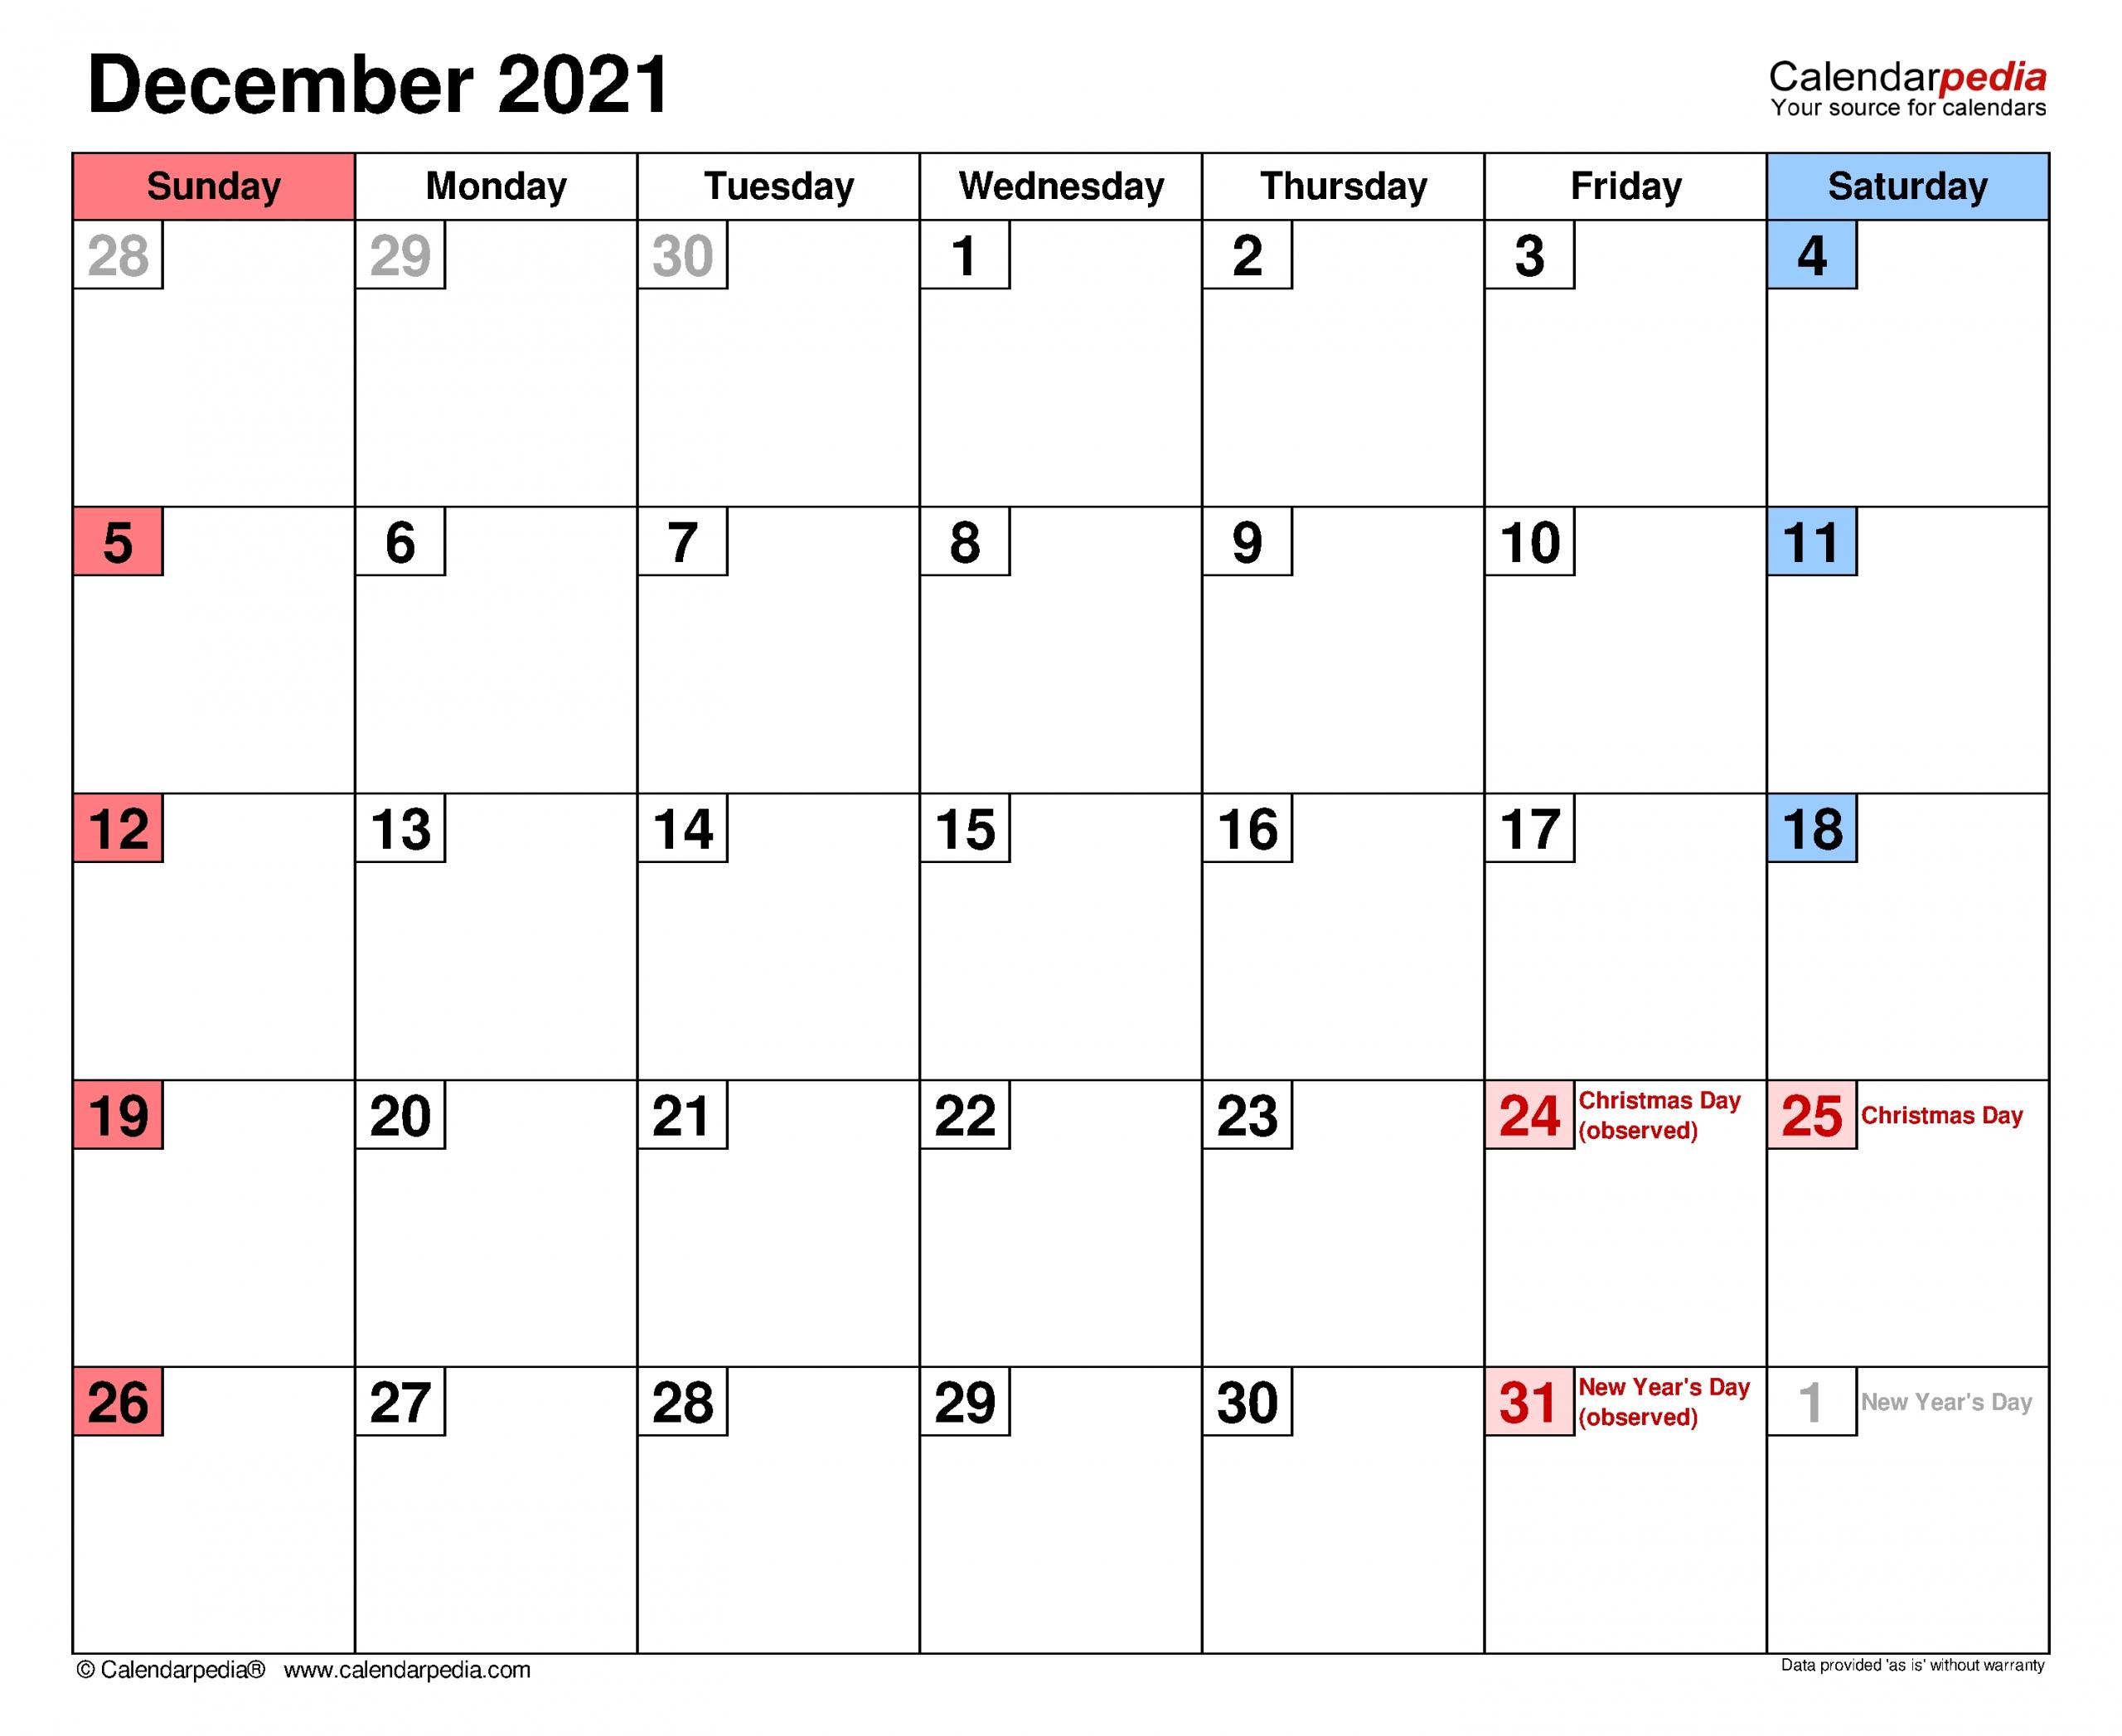 December Calendar 2021 Printable